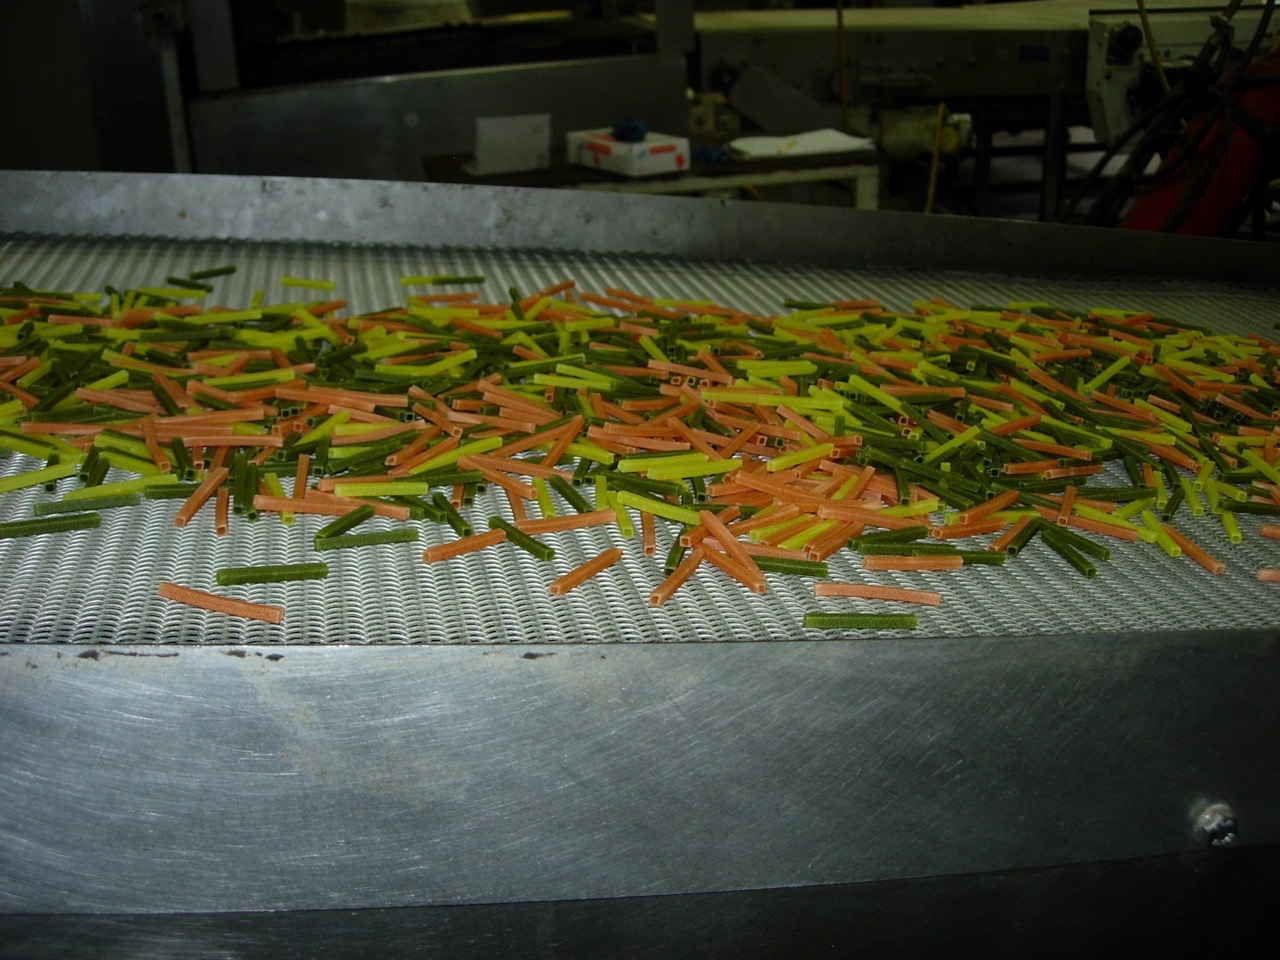 Freshly made Sensible Portions Veggie Straws